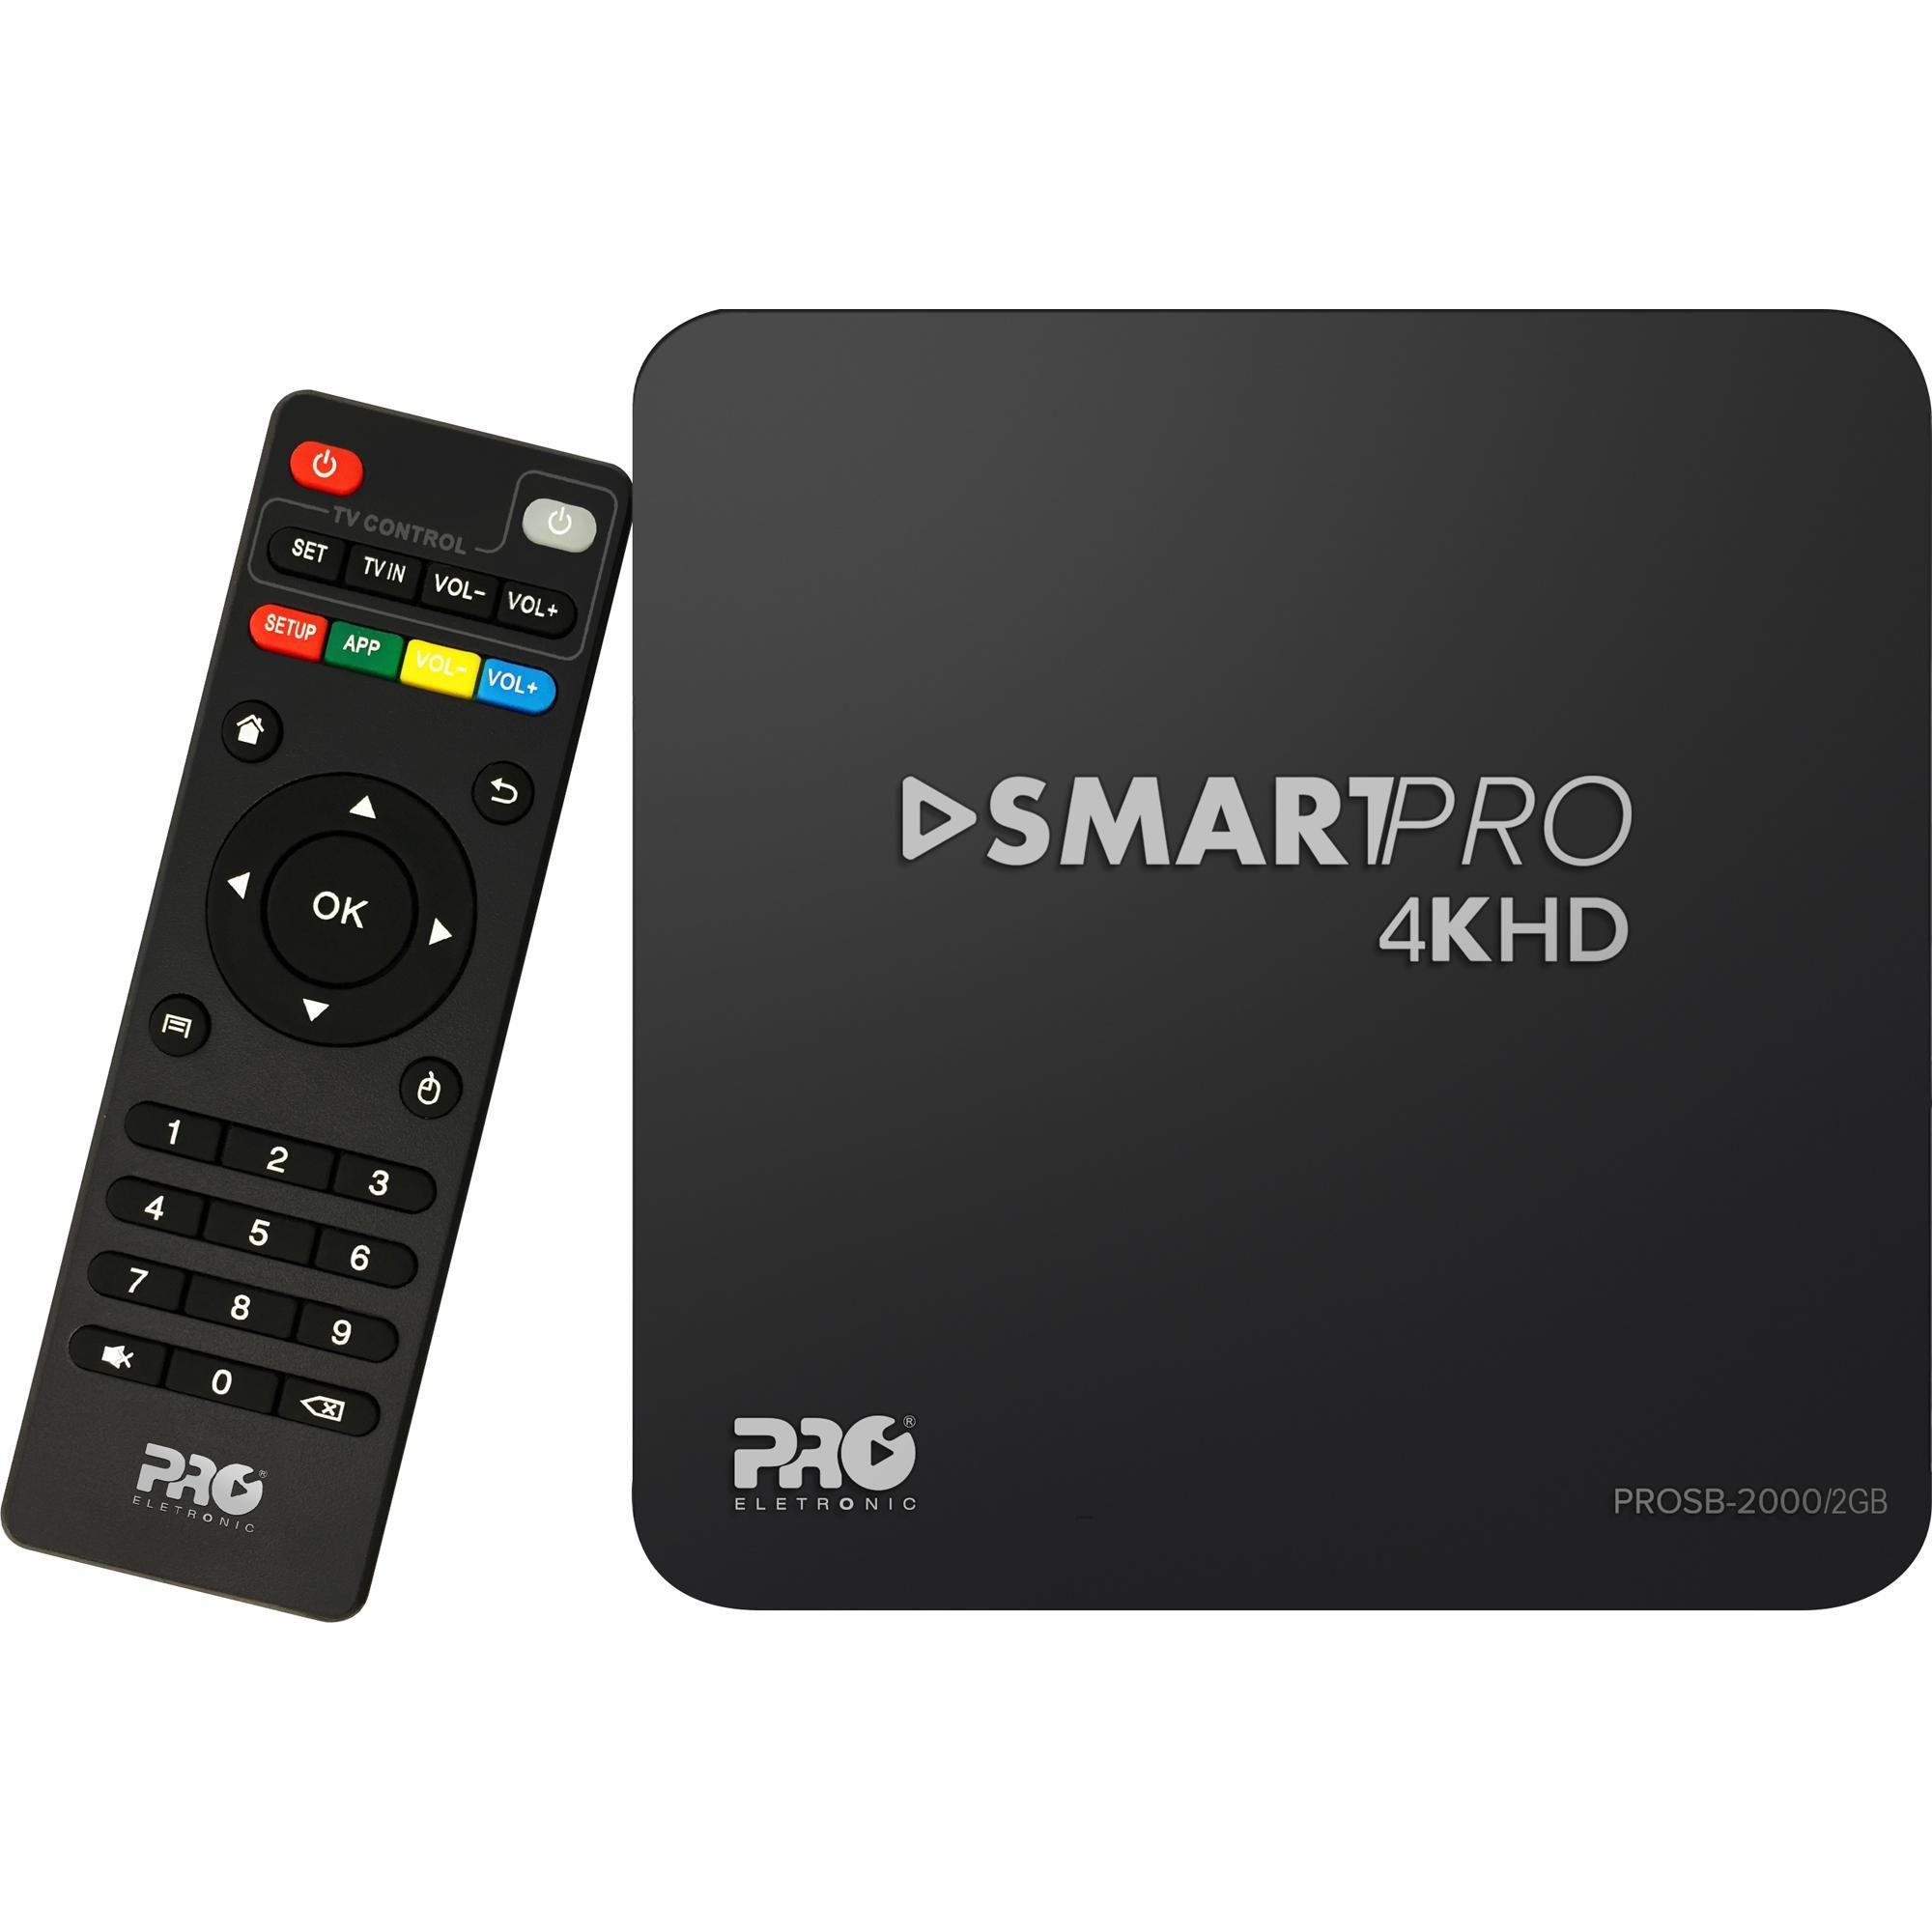 Smart TV Box Android 2GB PROSB-2000/2GB Preto PROELETRONIC